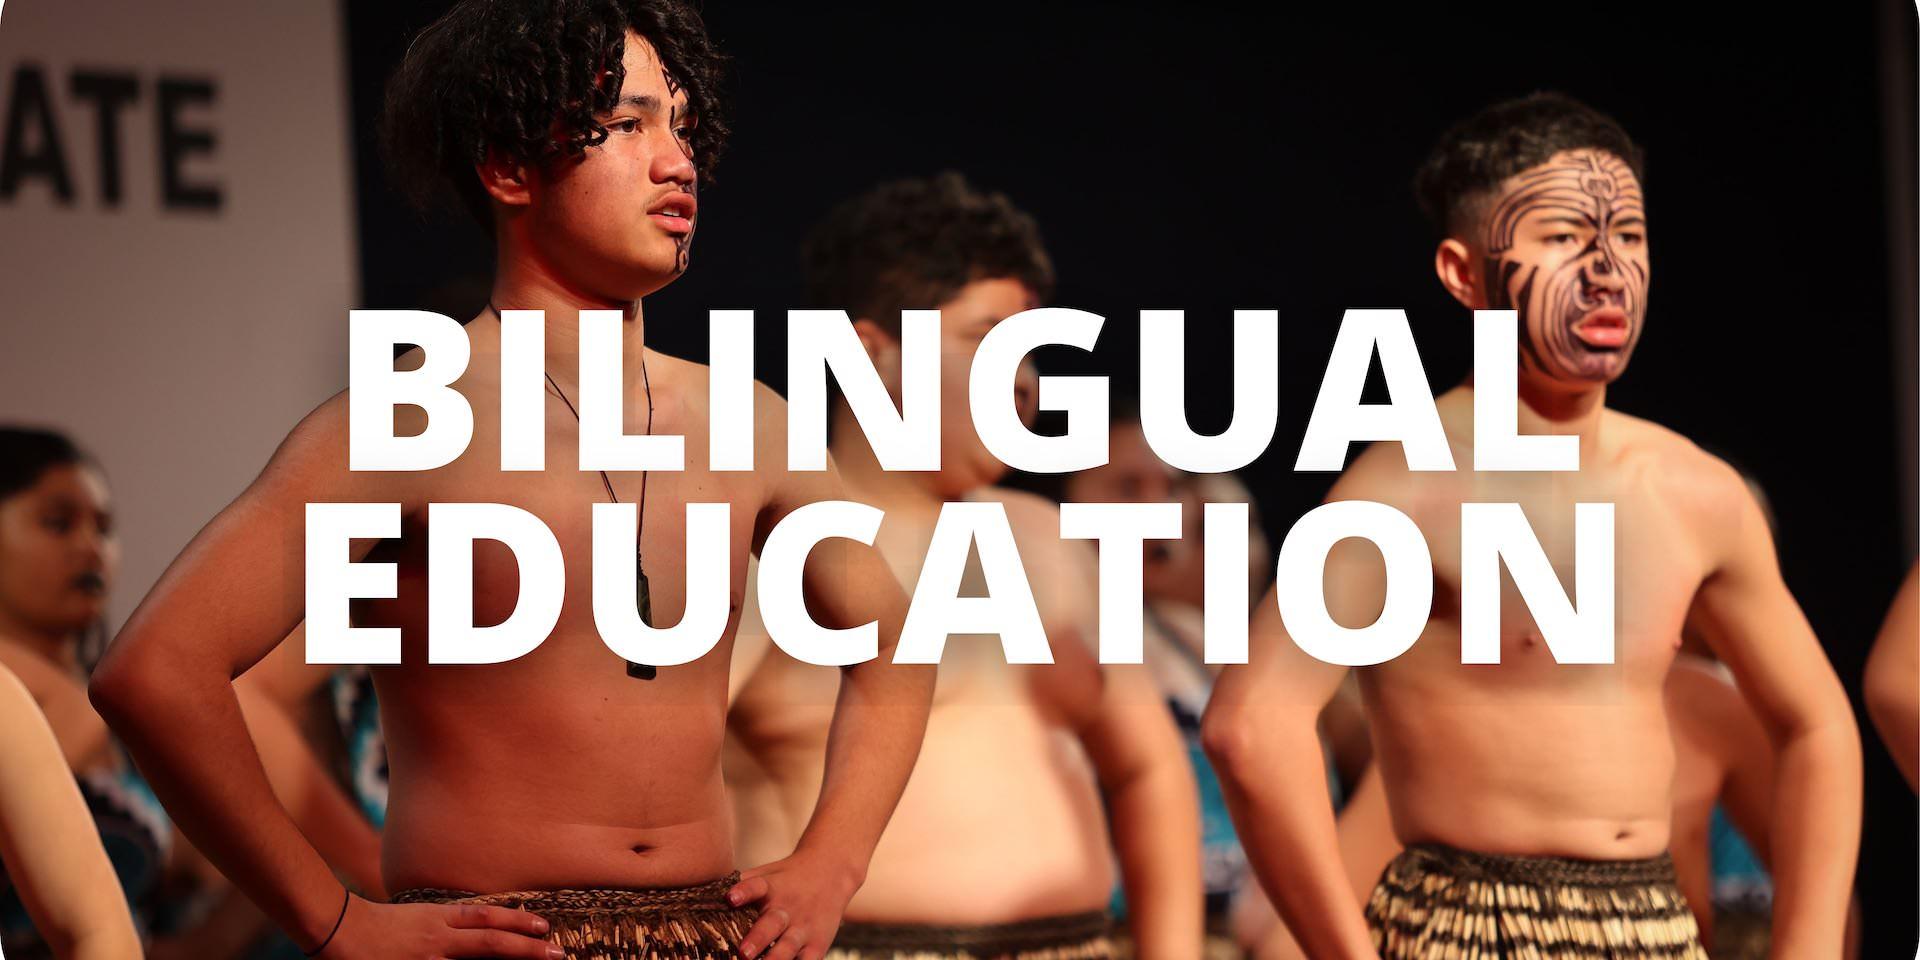 Billingual Education Title